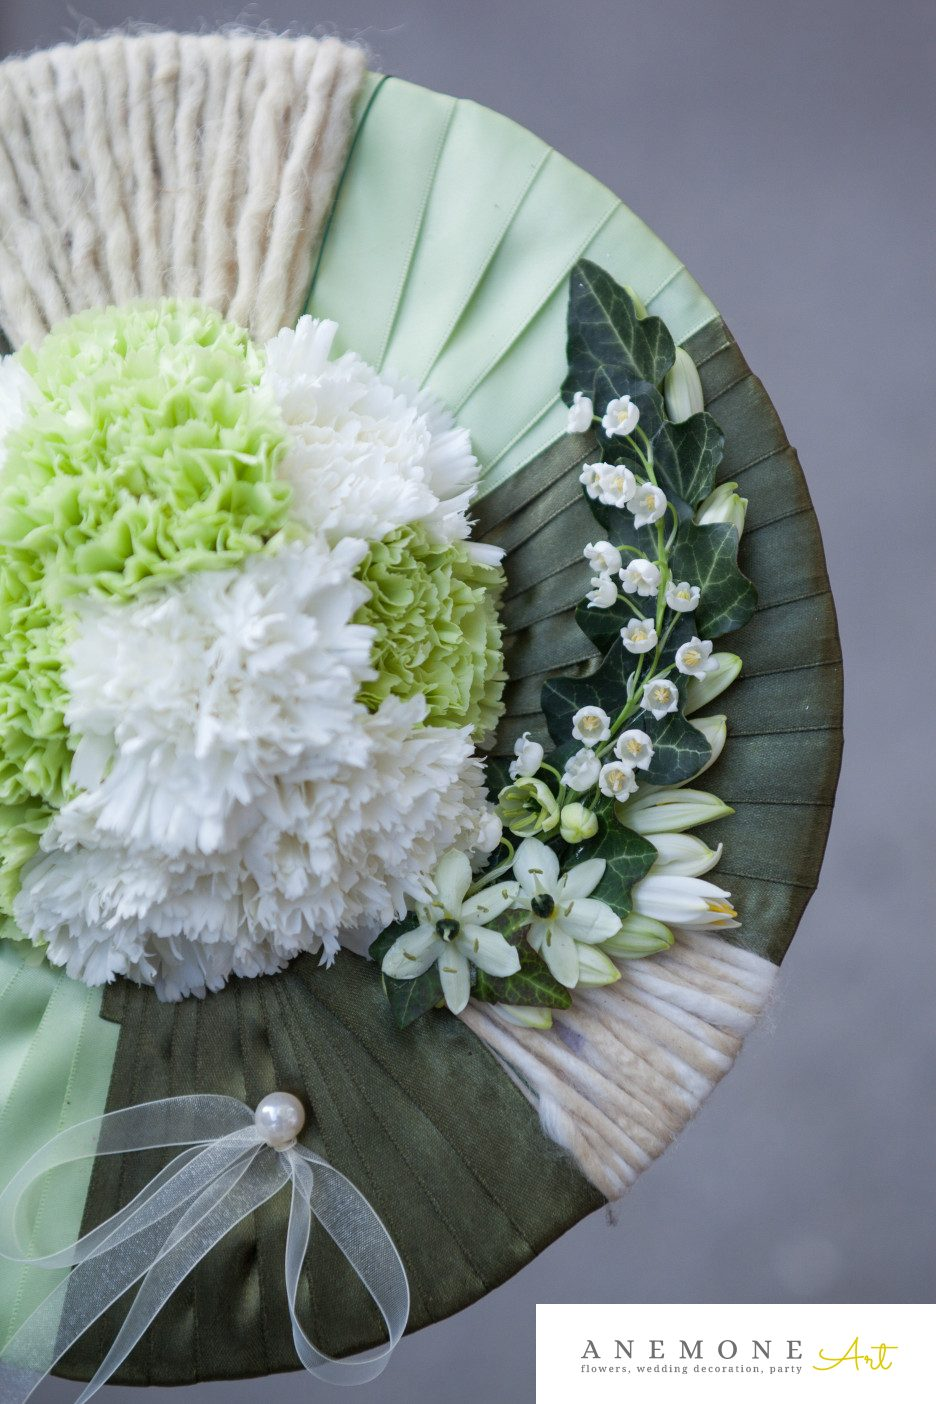 Poza, foto cu Flori de nunta lacramioare, pernita verighete in Arad, Timisoara, Oradea (wedding flowers, bouquets) nunta Arad, Timisoara, Oradea